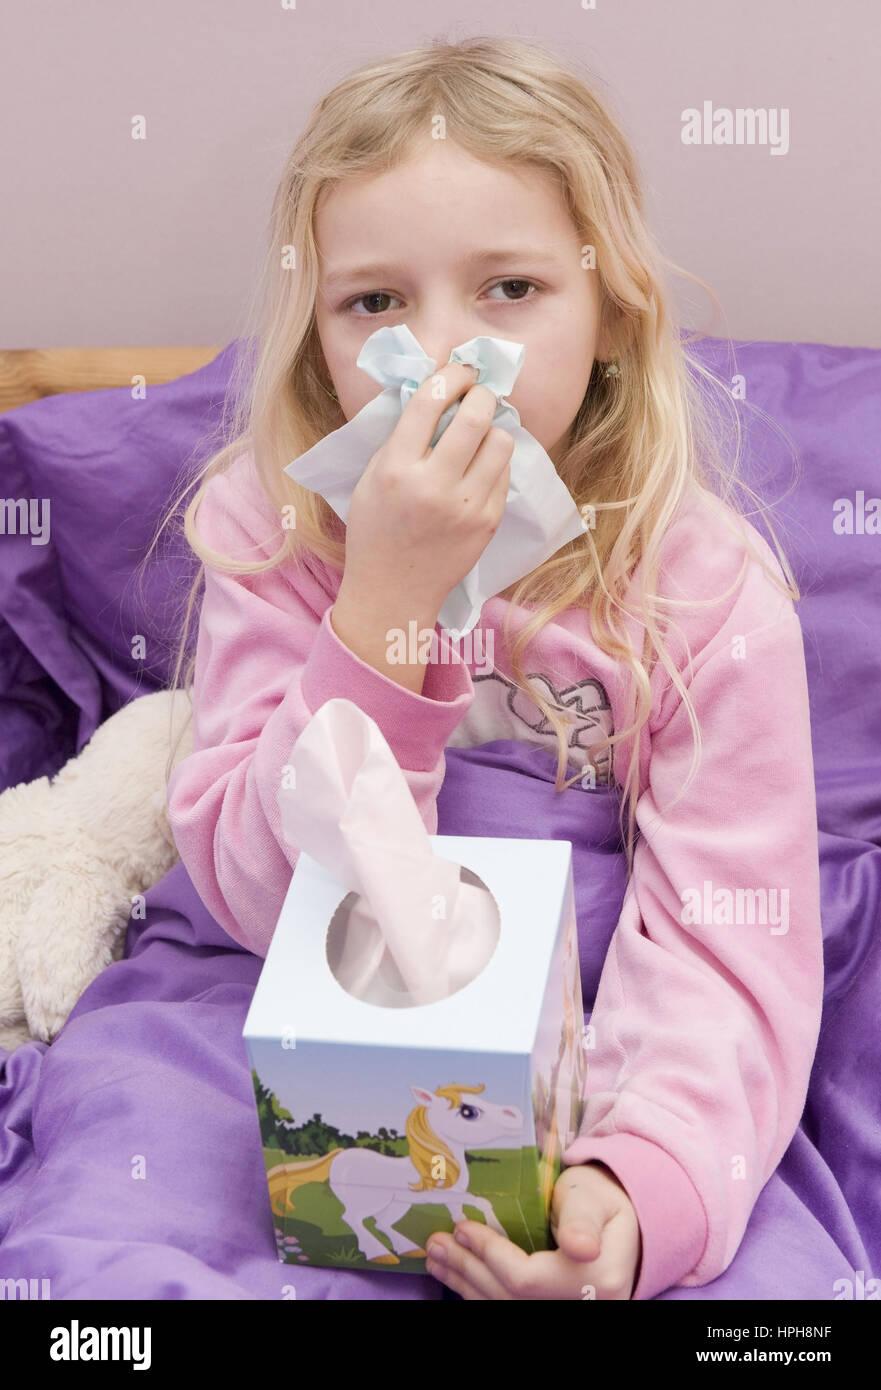 Maedchen mit Erkaeltung im Bett - sick girl in bed, Model released Stock Photo